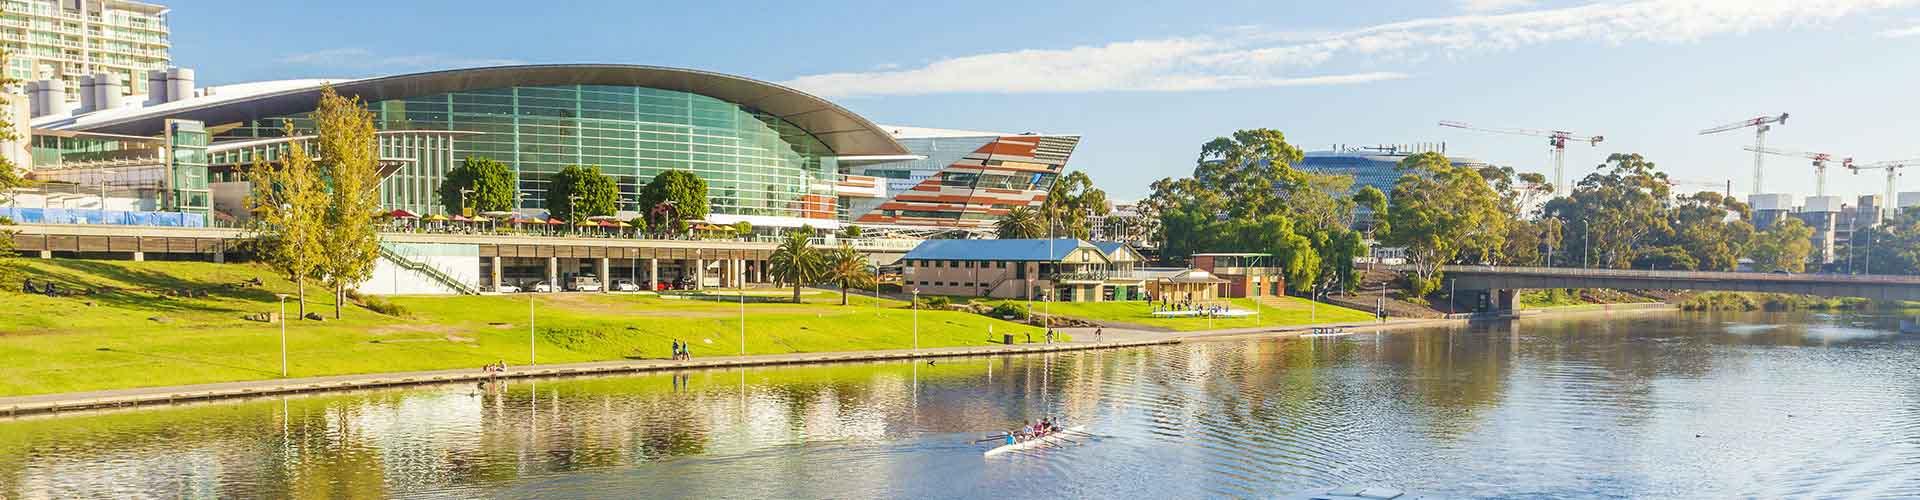 阿德莱德 – Adelaide Central Business District区的青年旅馆。阿德莱德 地图,阿德莱德 每间青年旅馆的照片和评分。